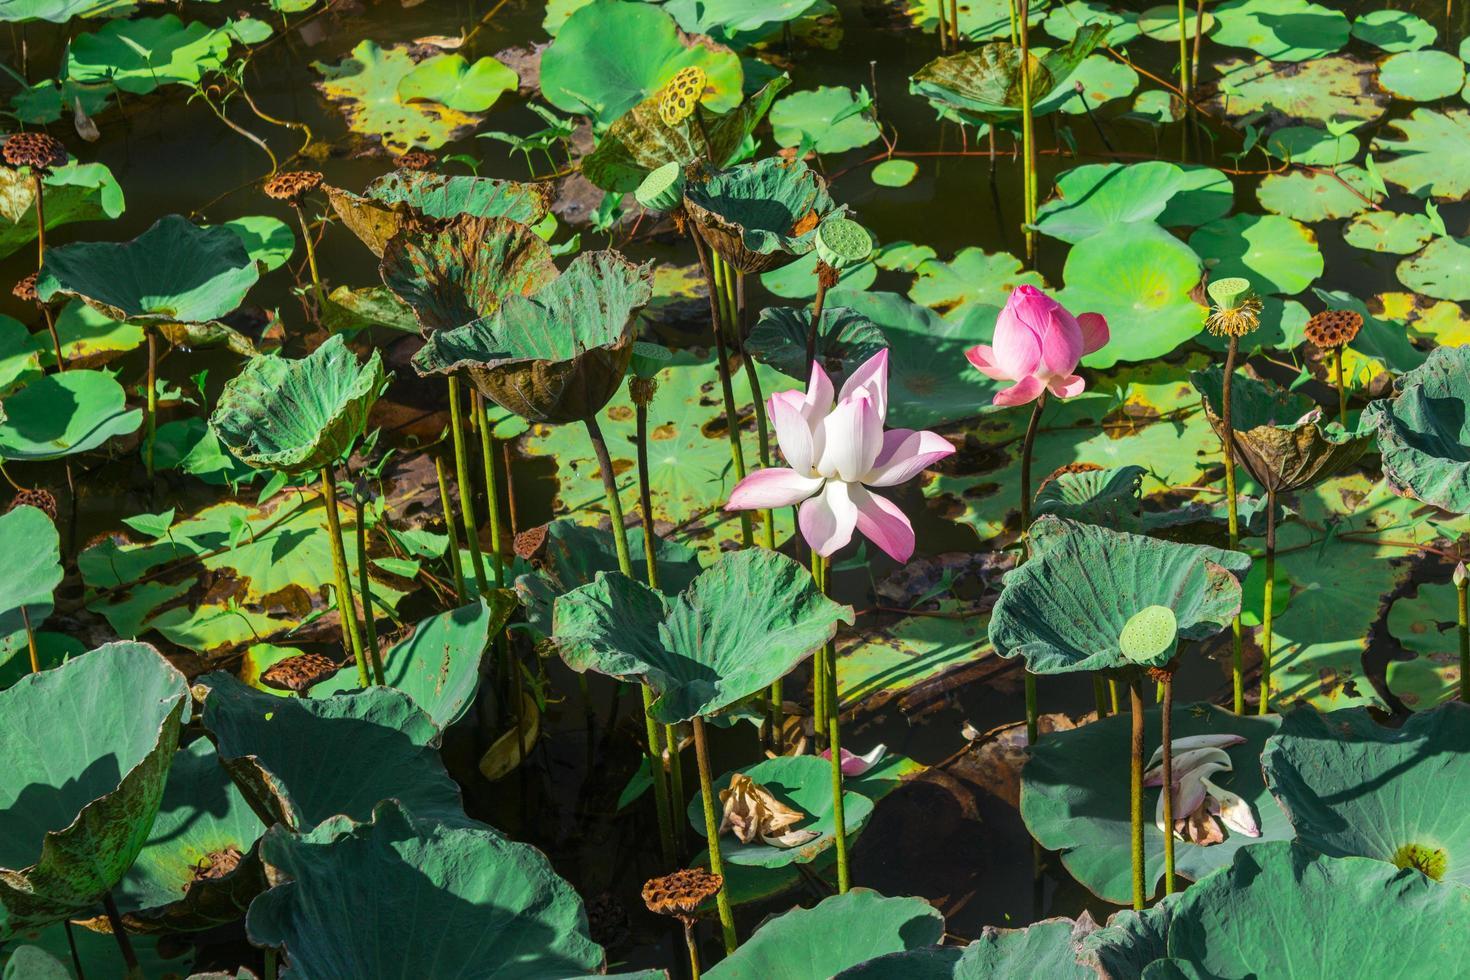 lotusvijver gedurende de dag foto